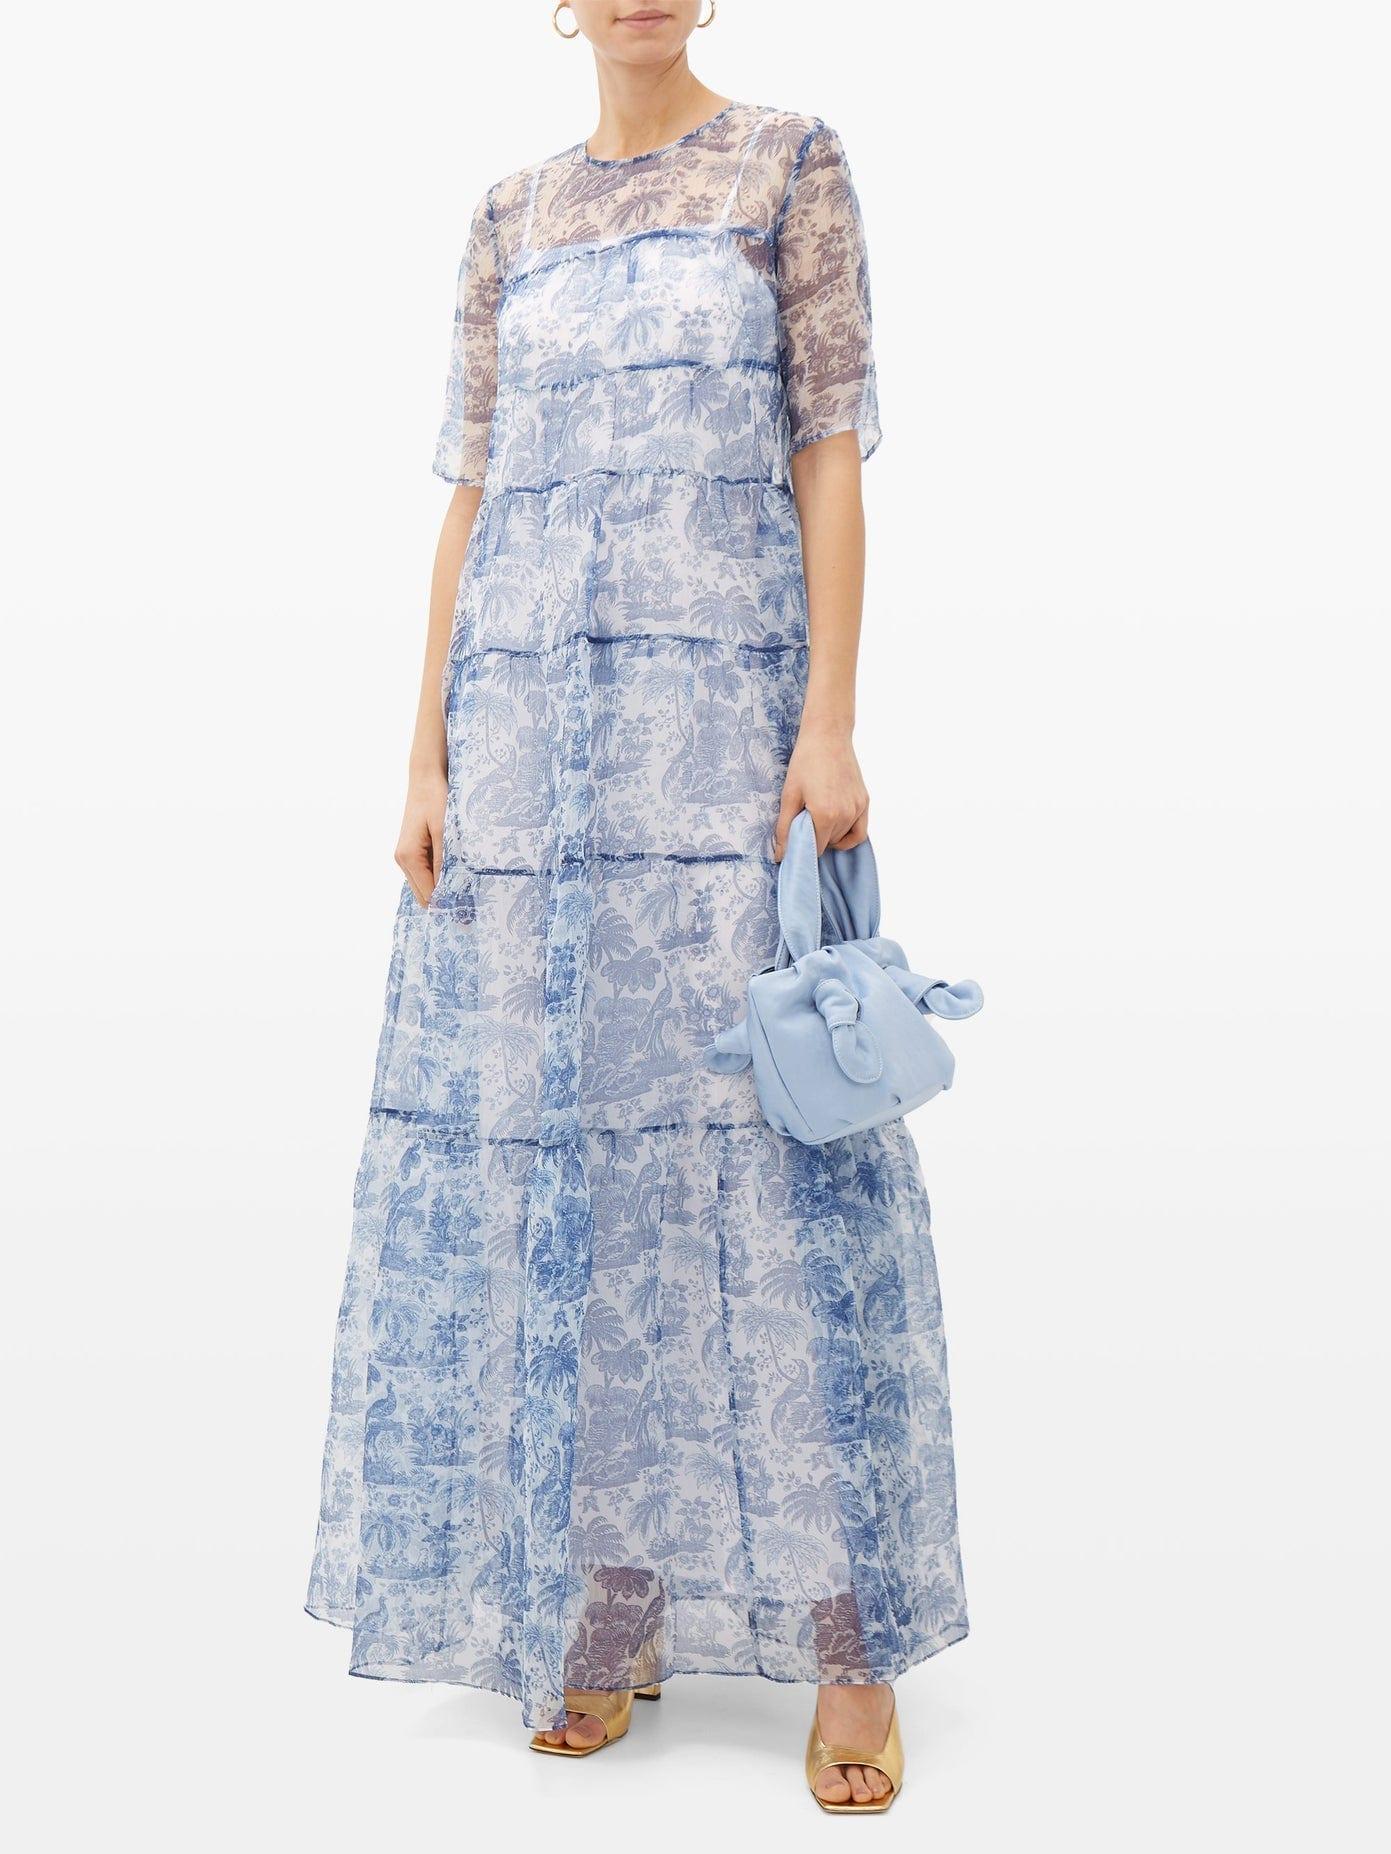 STAUD China Palm-print Gauze Dress